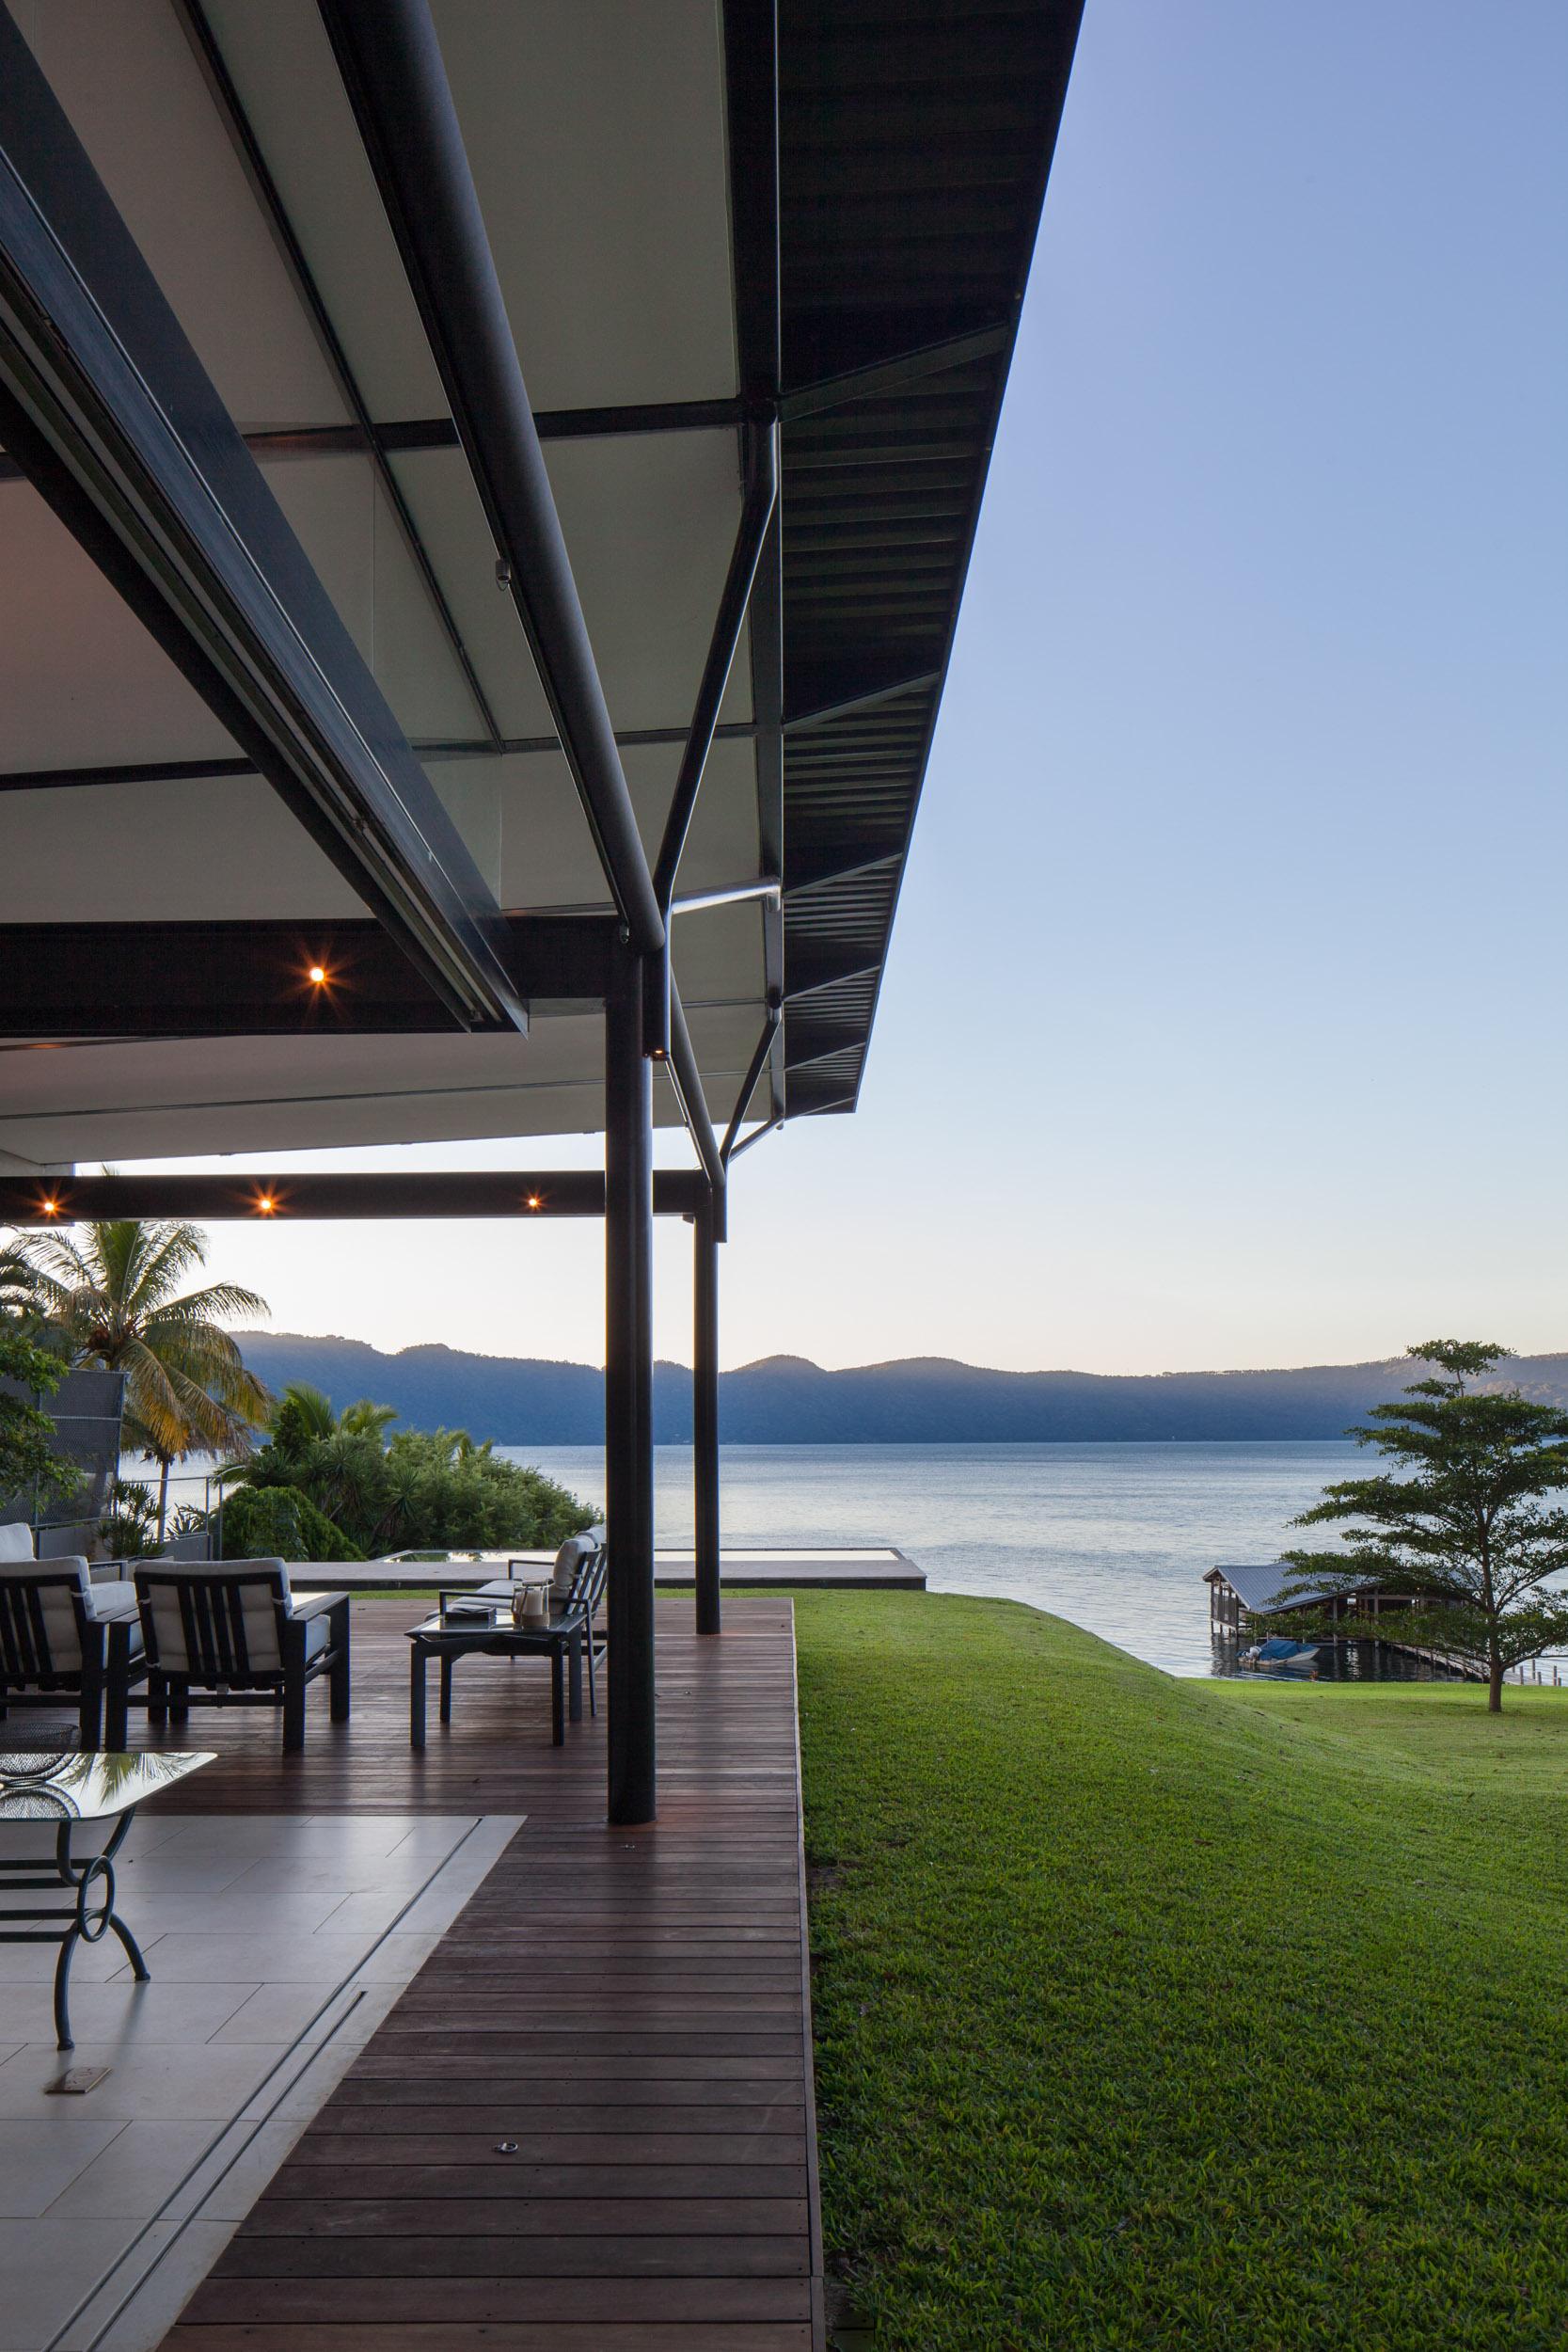 Jason_Bax_SQ_Lake_House_El_Salvador_Architecture_MG_0341.jpg